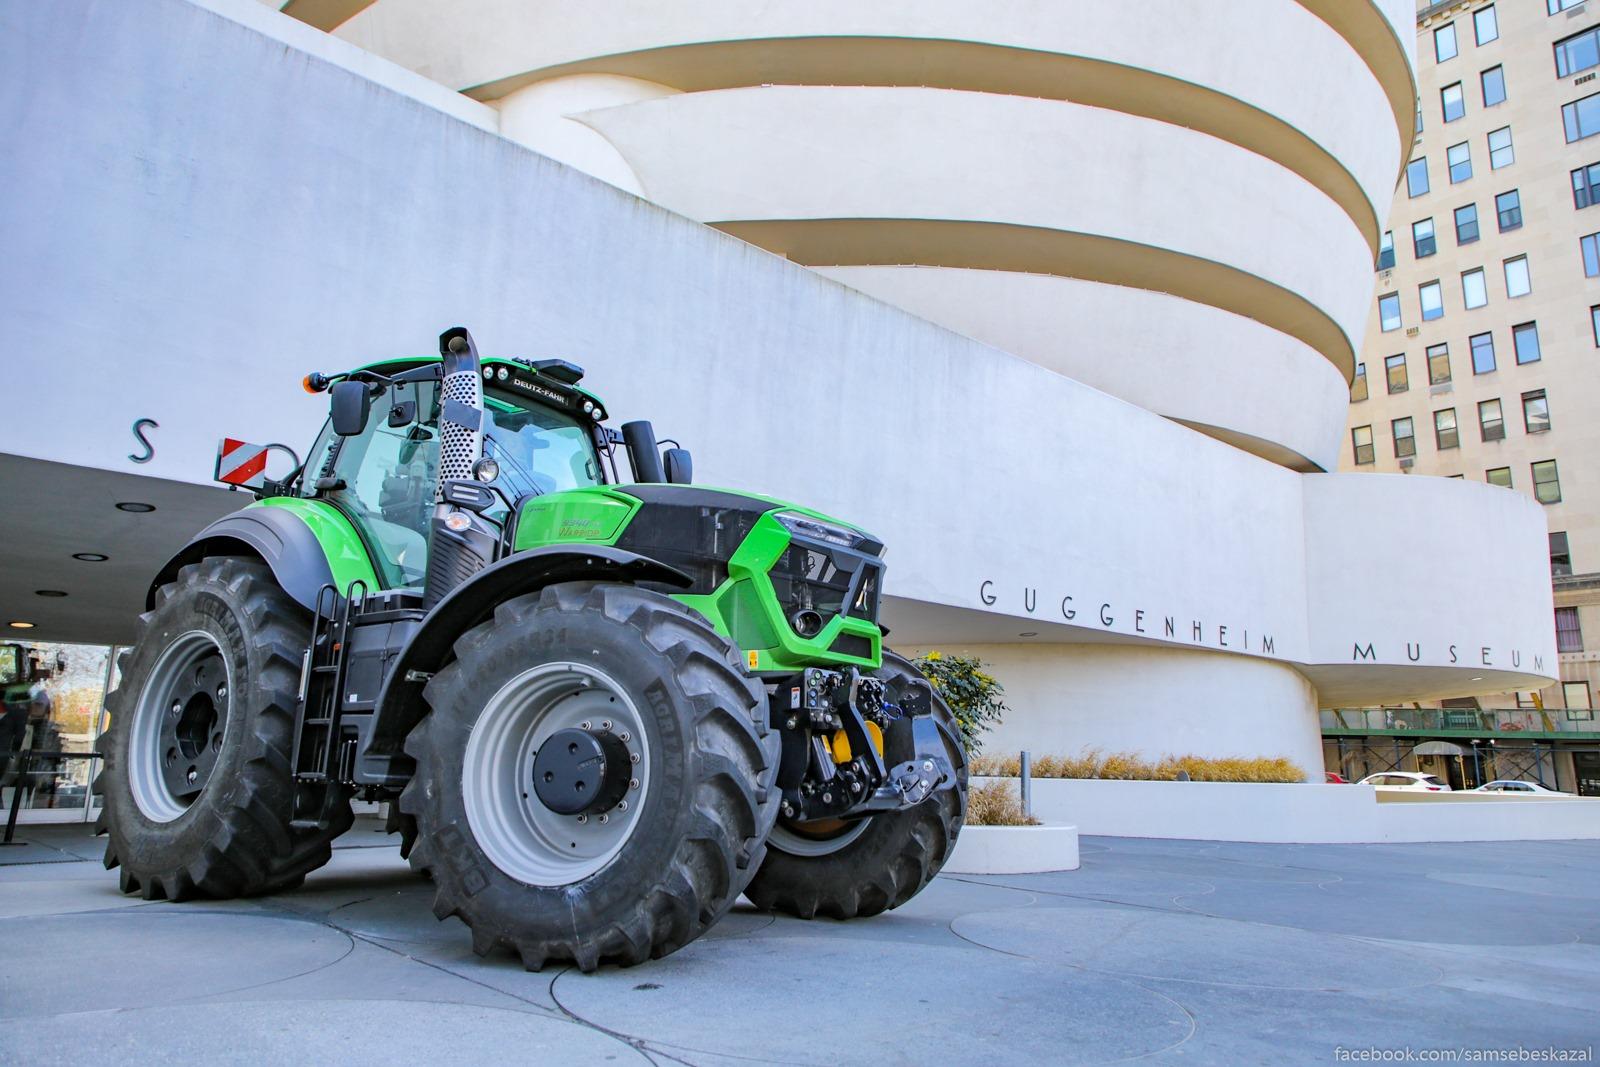 Muzej Gugenhajma zakryt, a u vhoda stoit ogromnyj traktor. Verhnij Ist-Sajd.